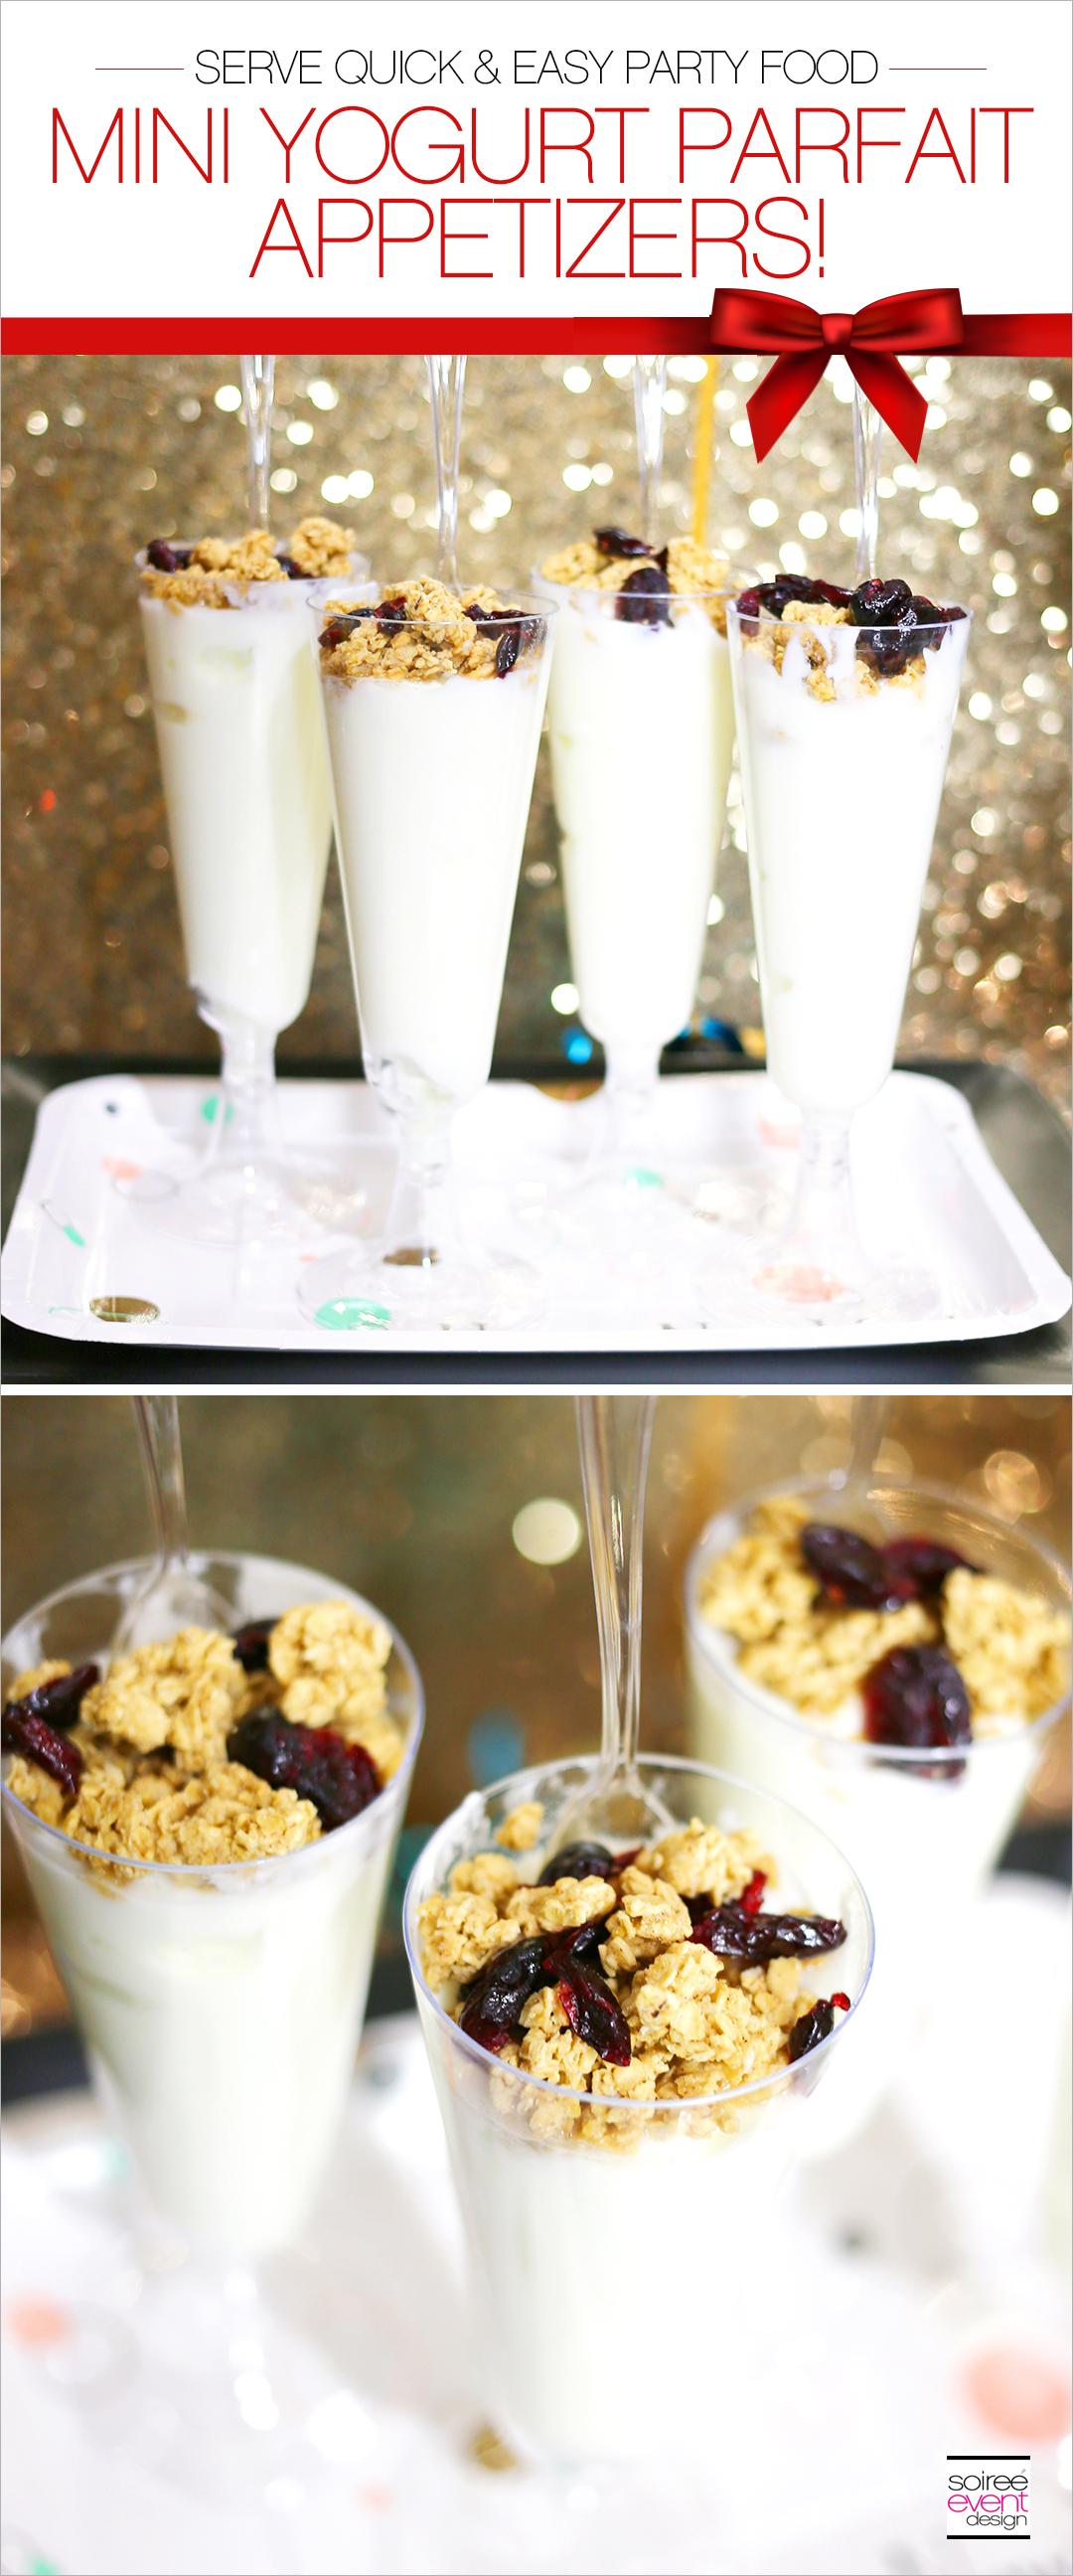 Mini Yogurt Parfait Appetizers